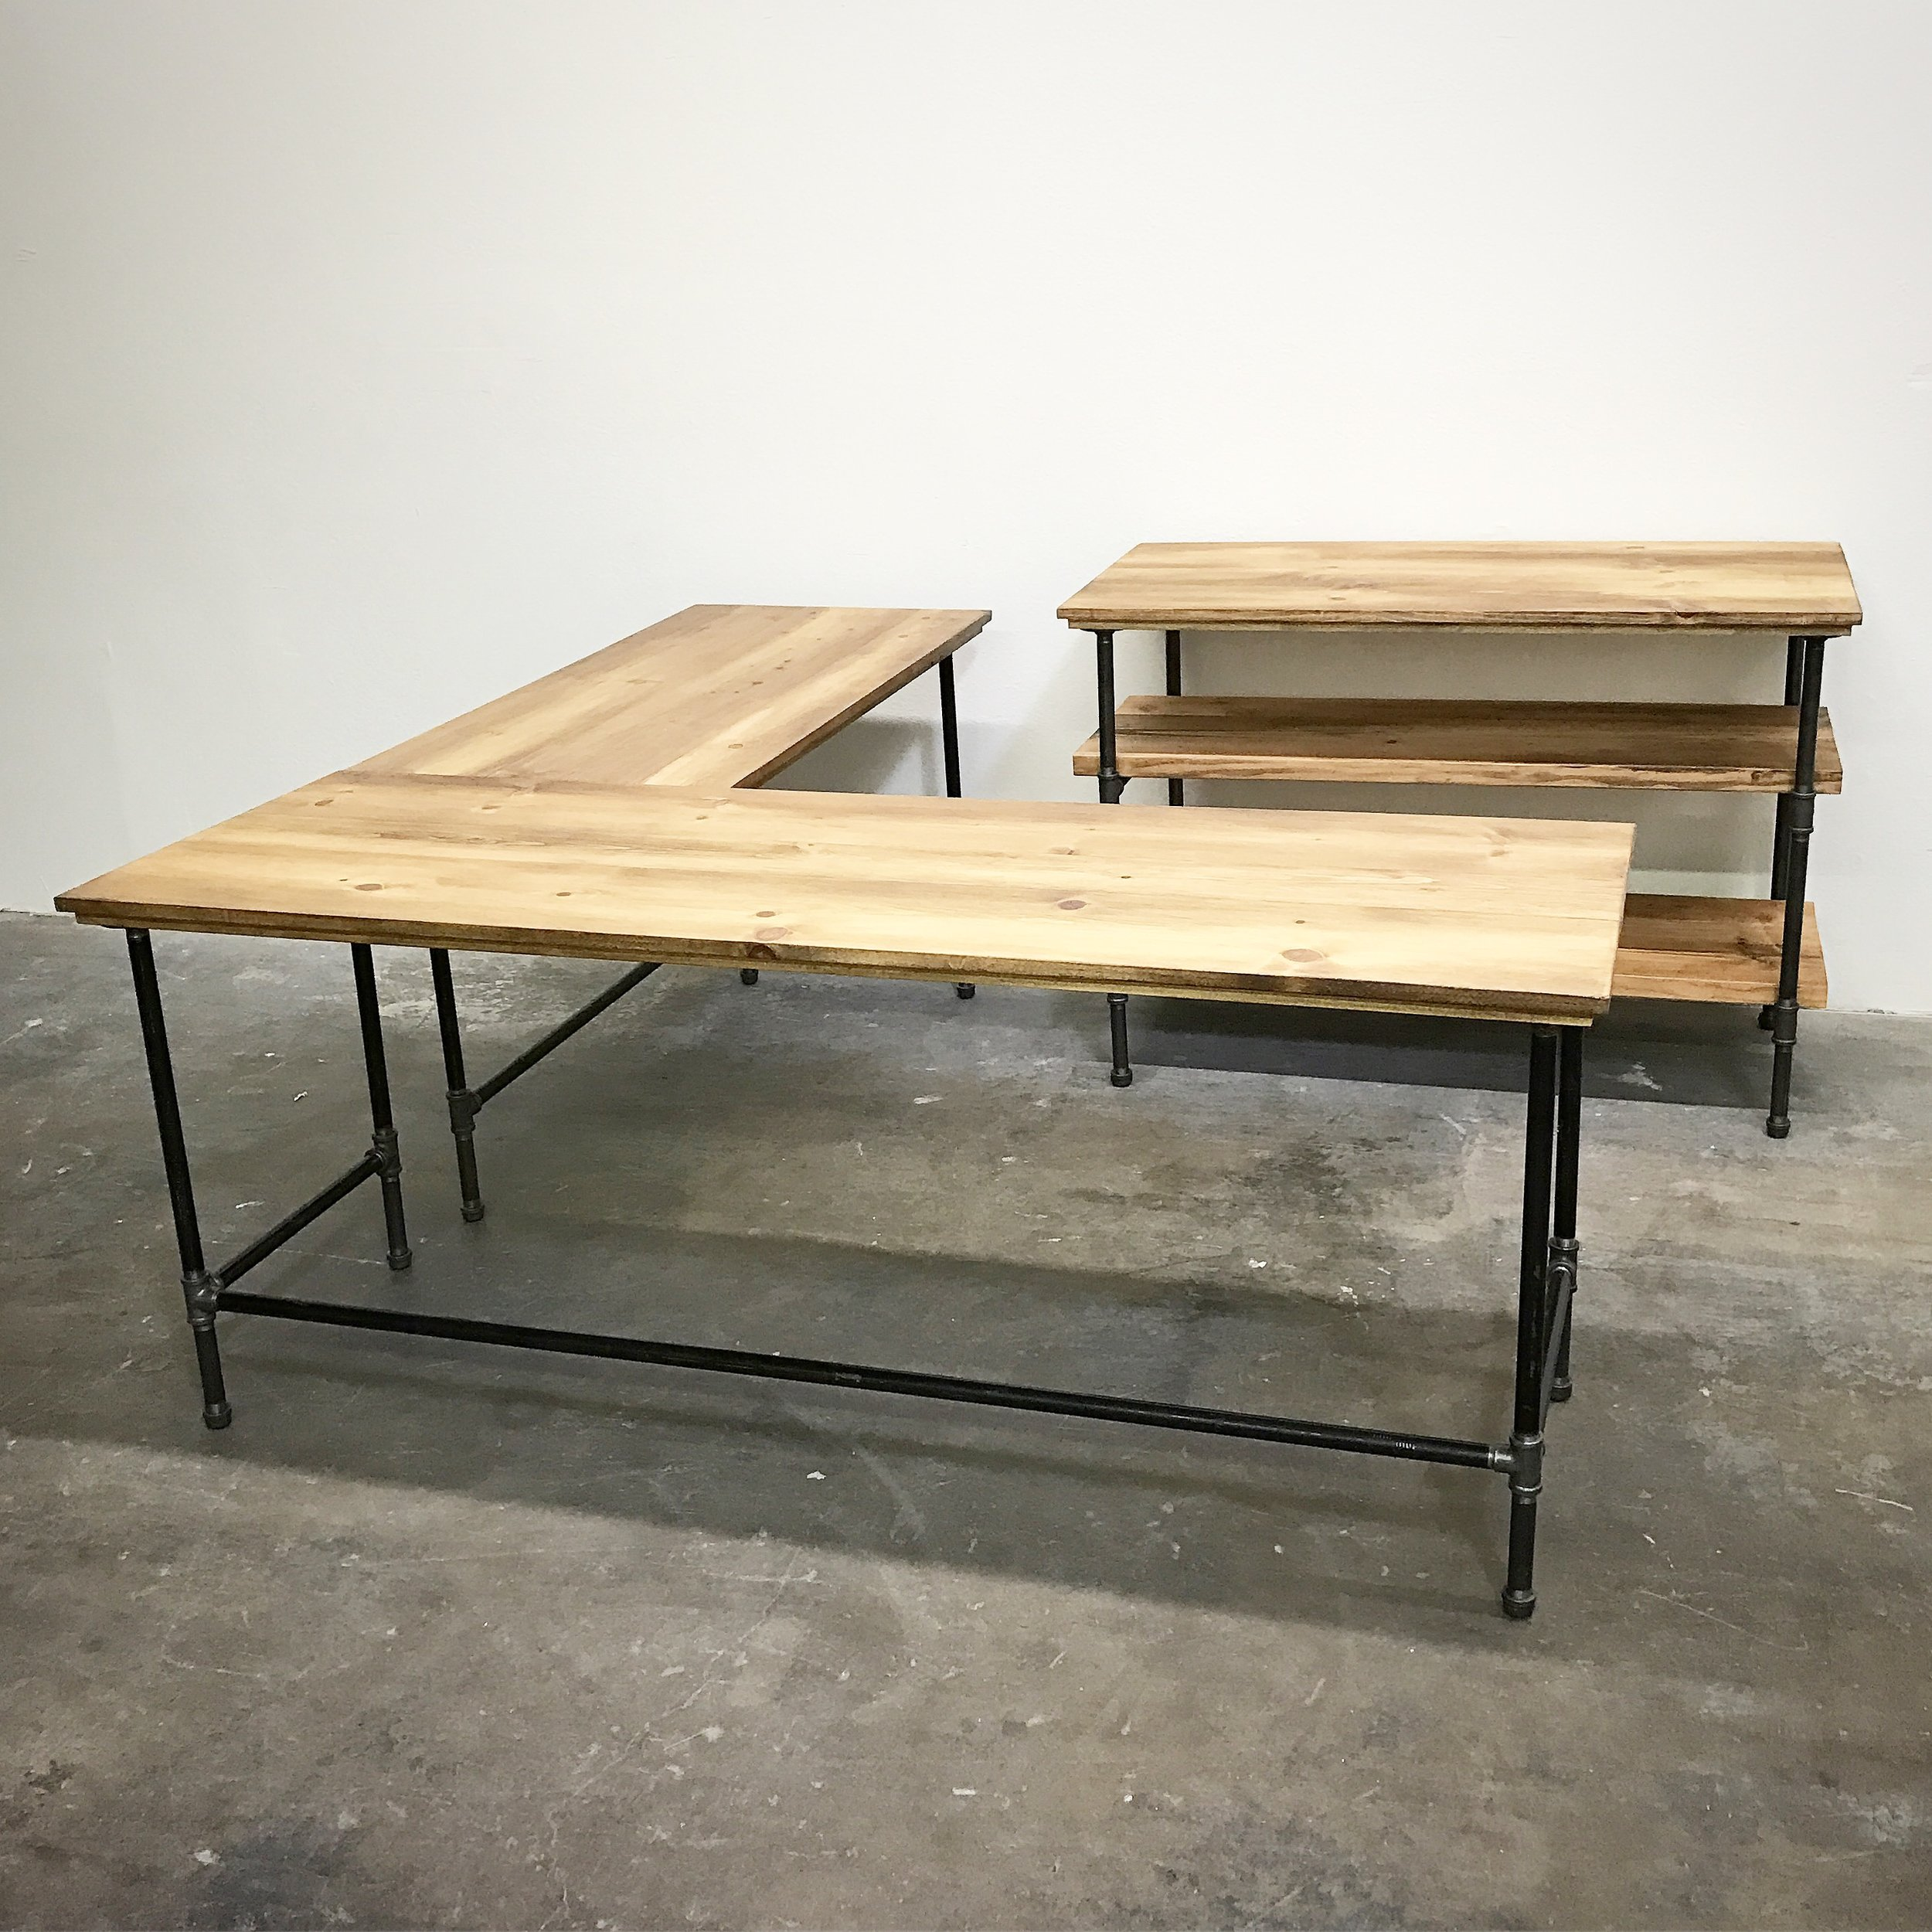 Wayne Corner Desk and Office Storage